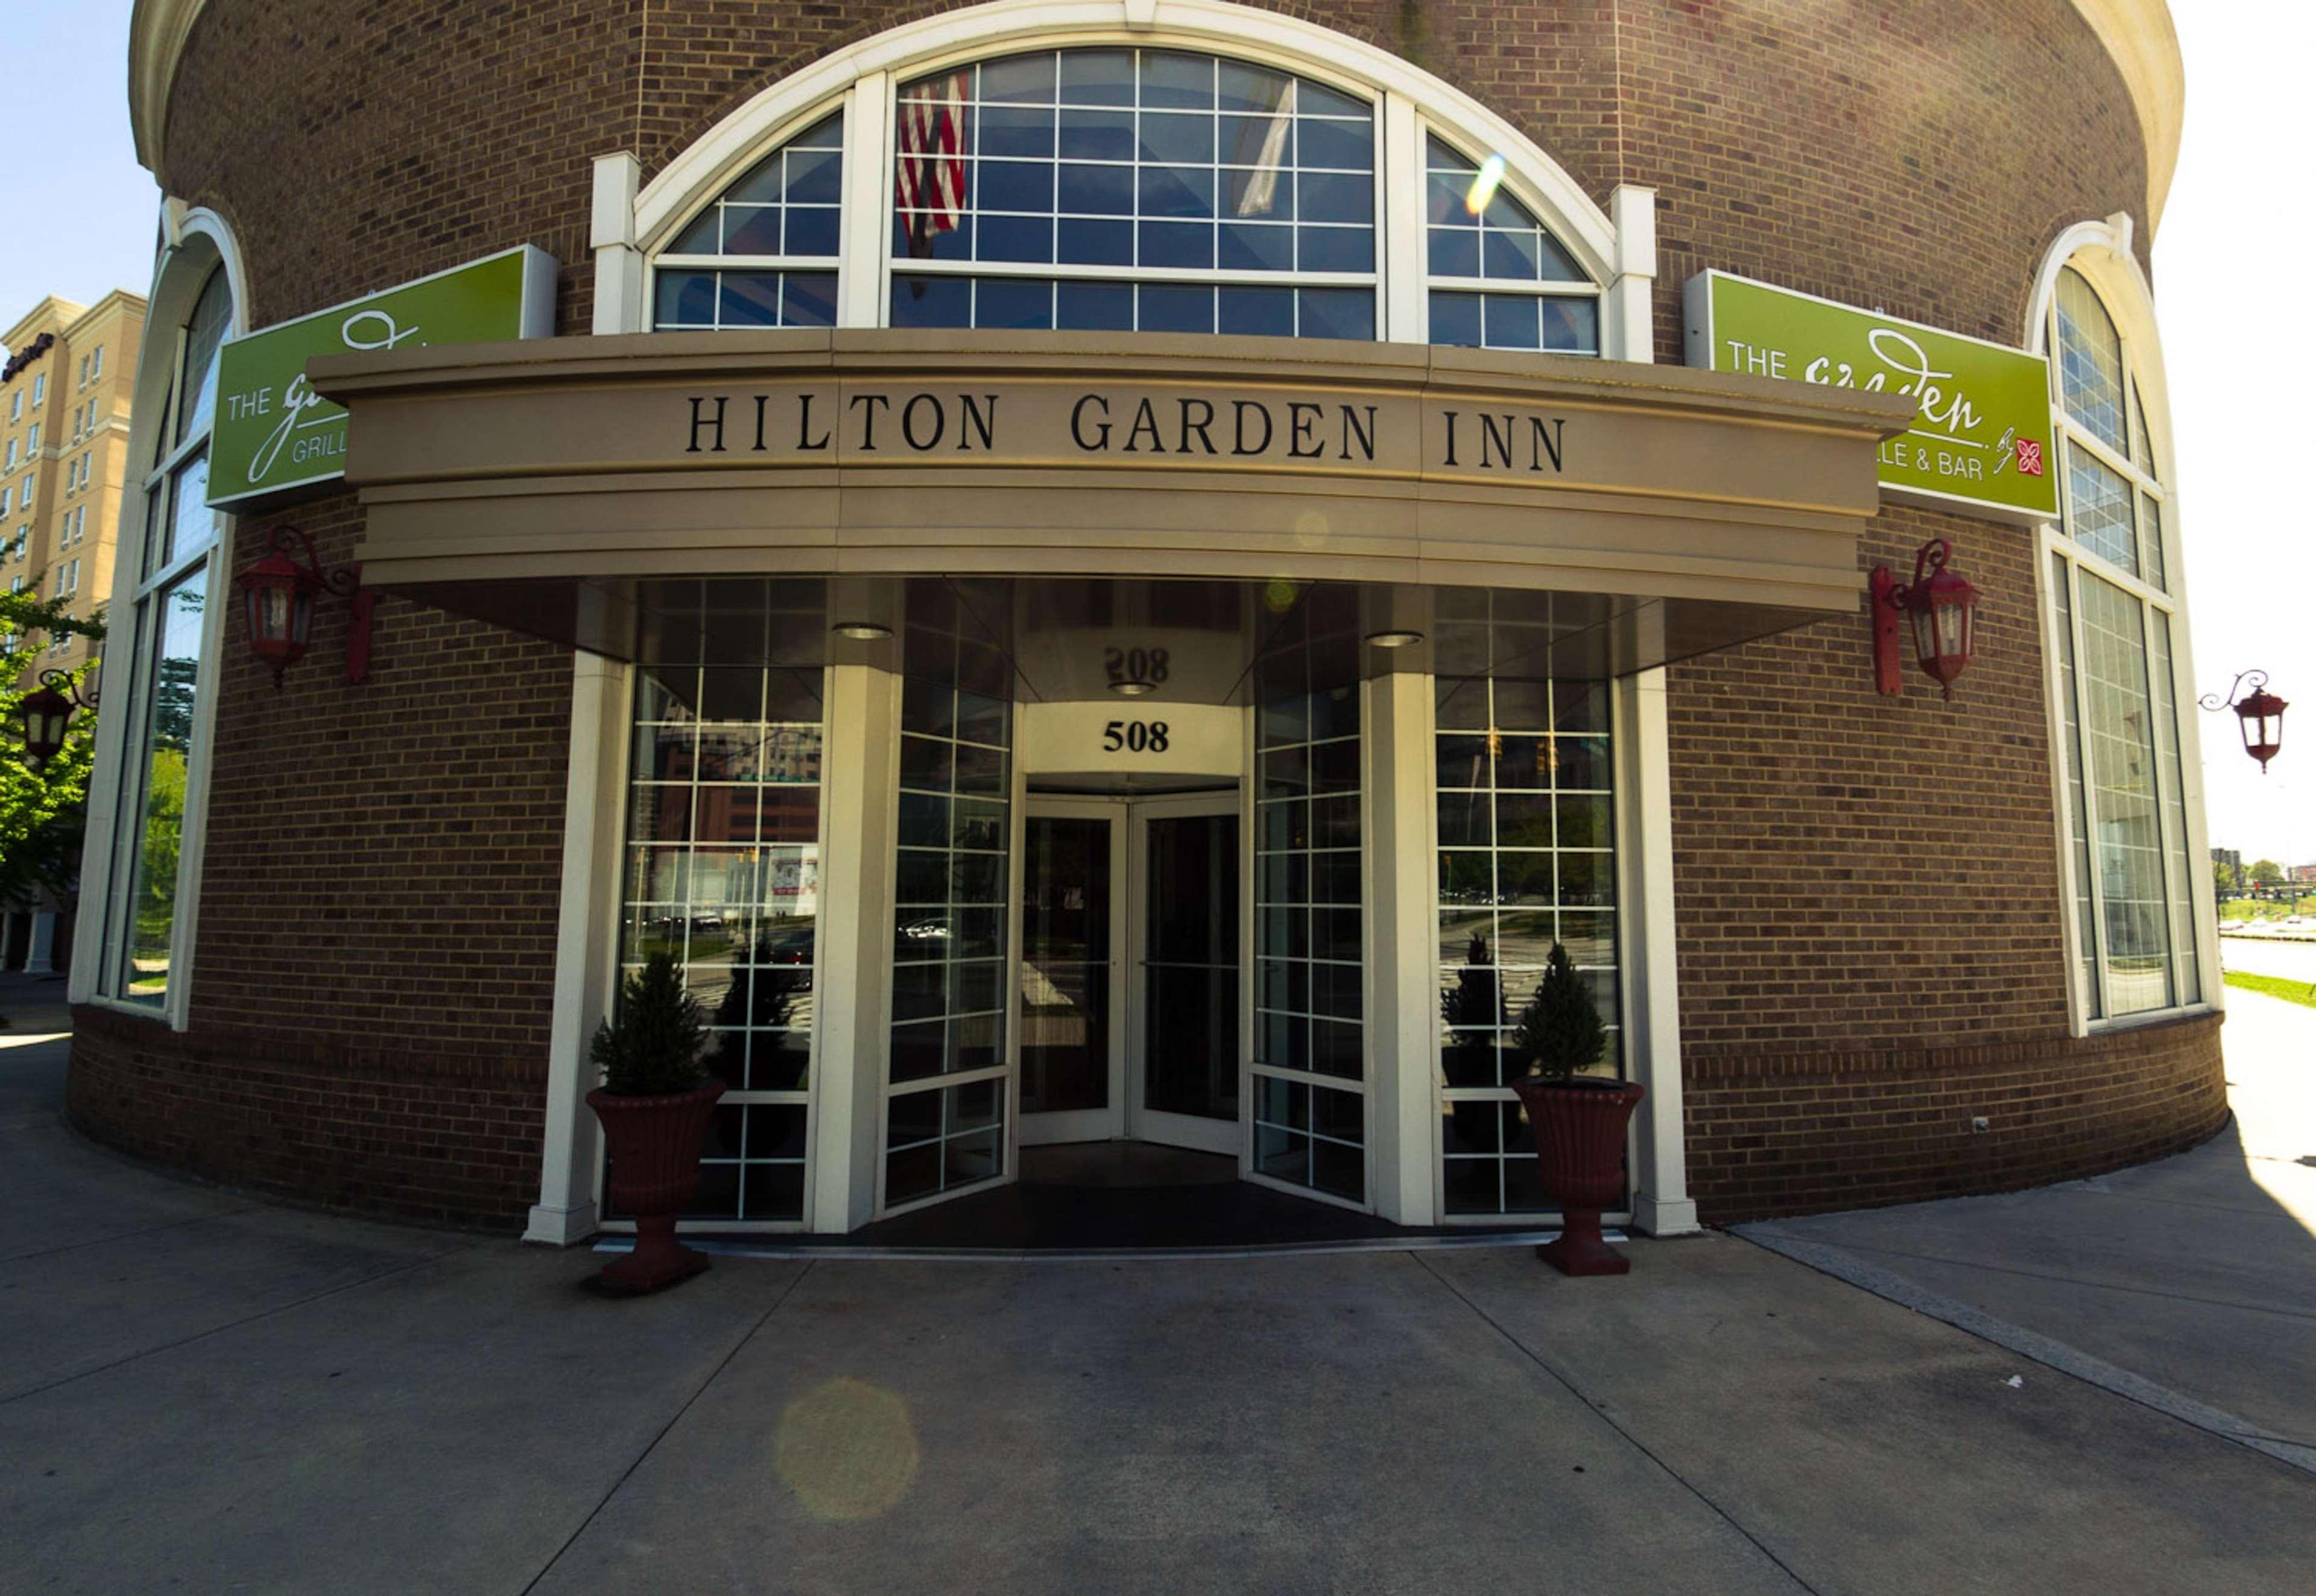 Hilton Garden Inn Charlotte Uptown At 508 E Martin Luther King Jr Blvd Charlotte Nc On Fave